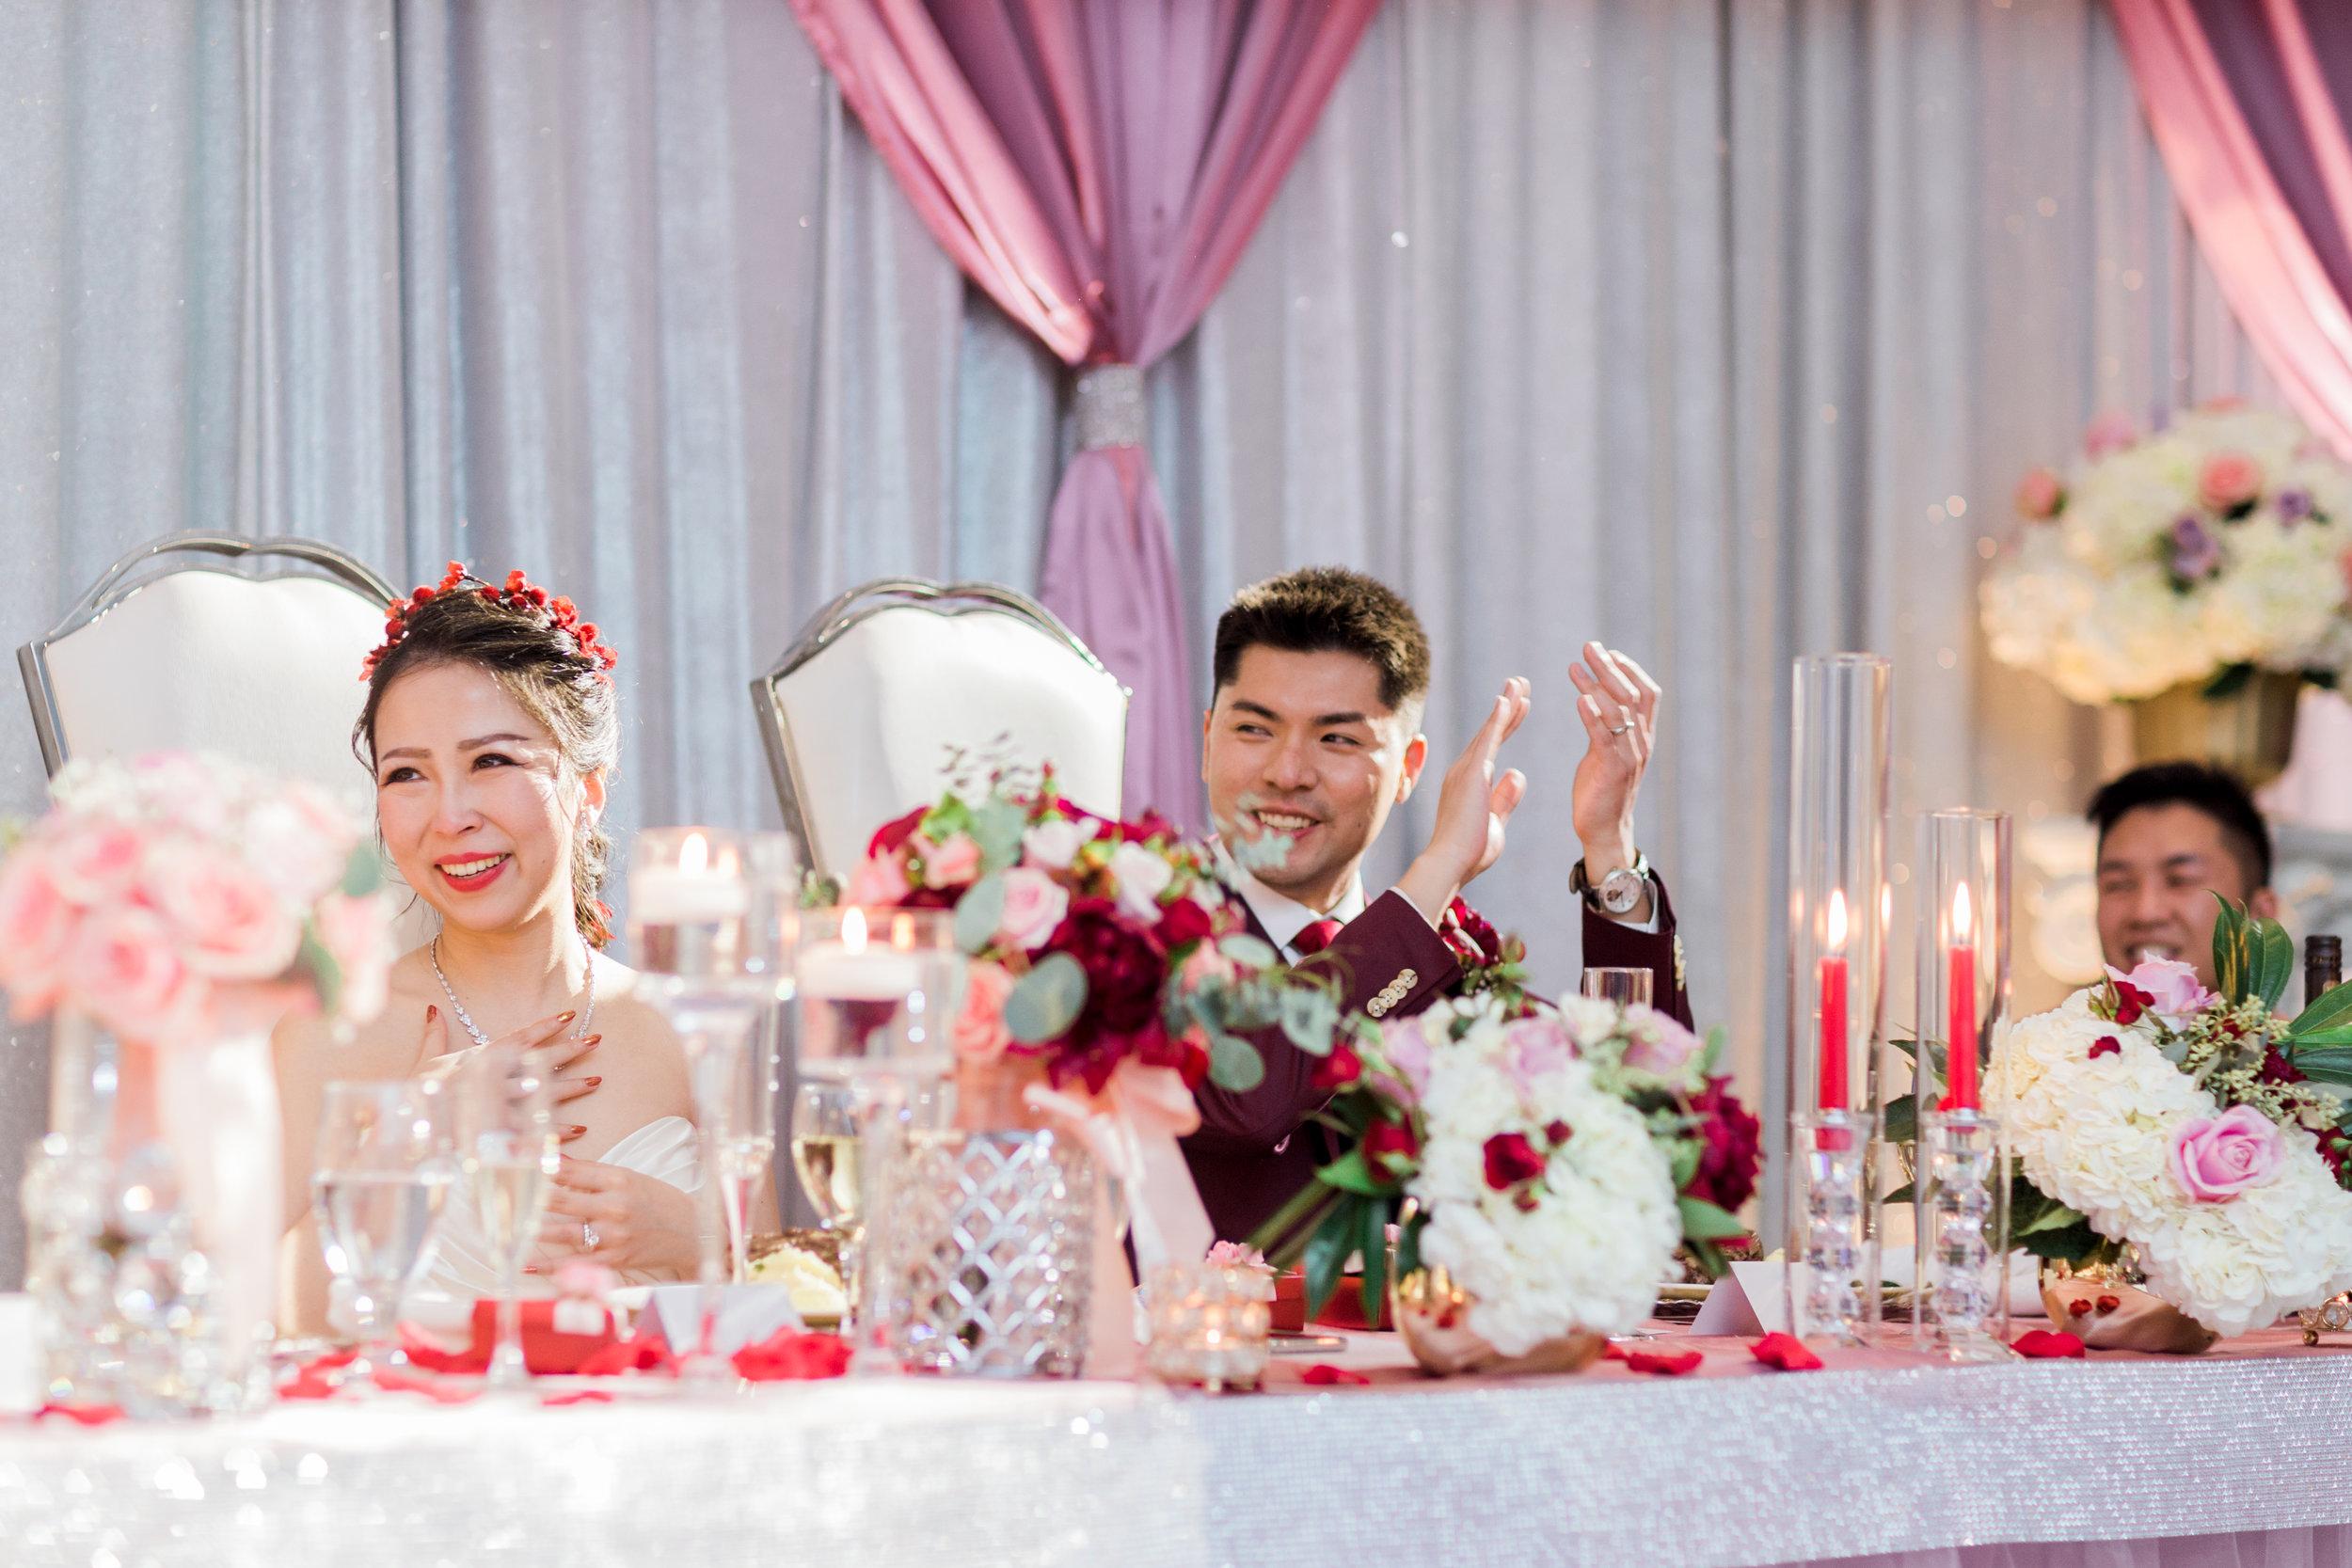 Parkview Manor Wedding - Reception-106.jpg